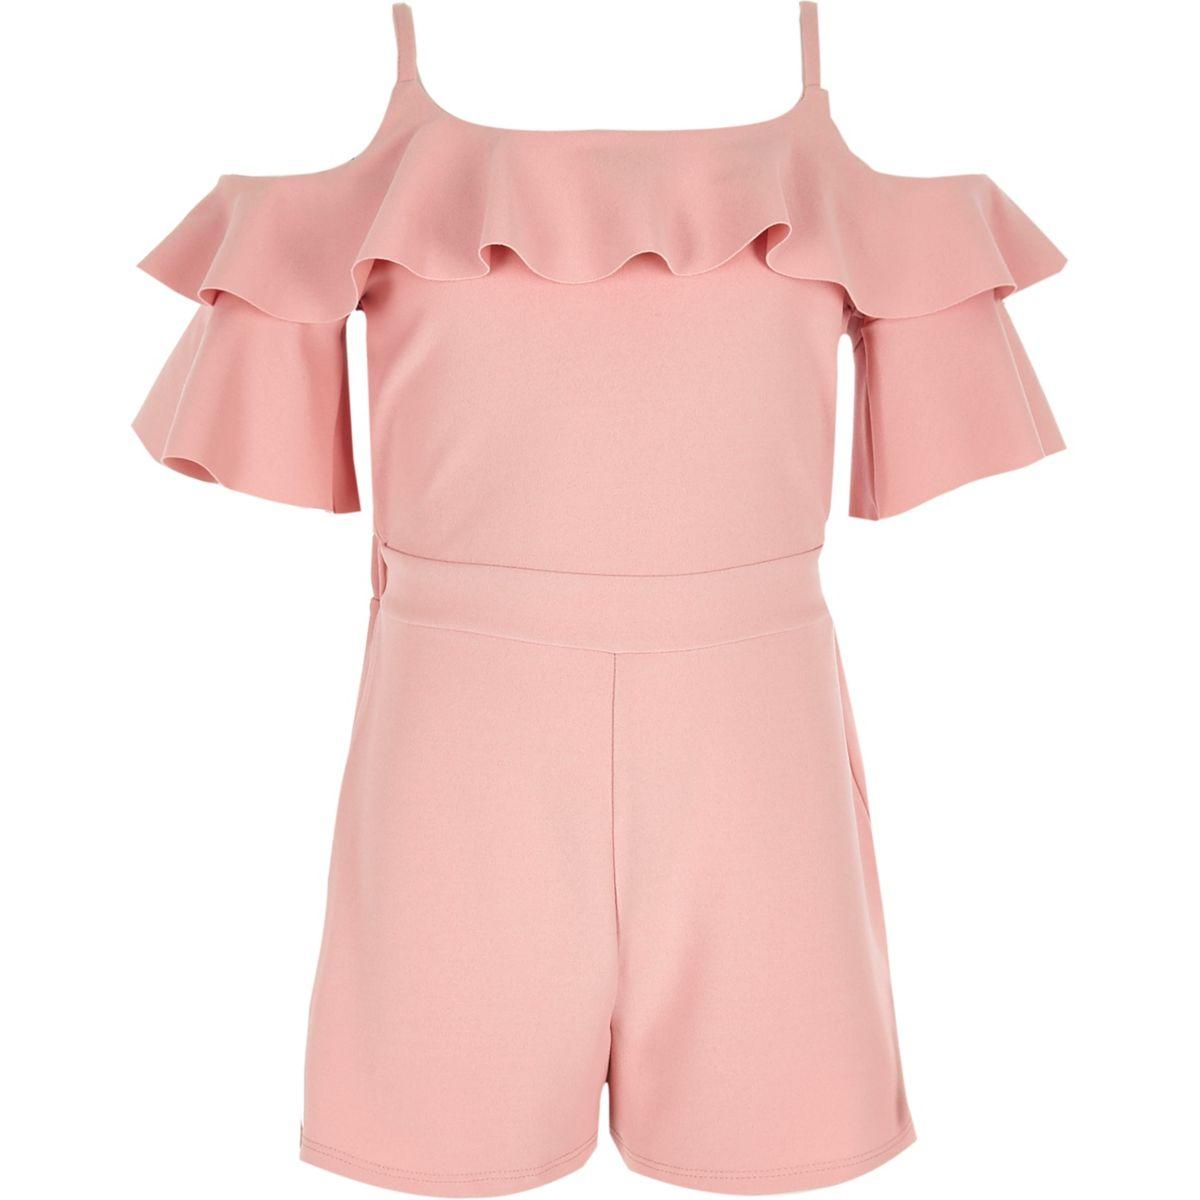 Pinker Overall mit Schulterausschnitten